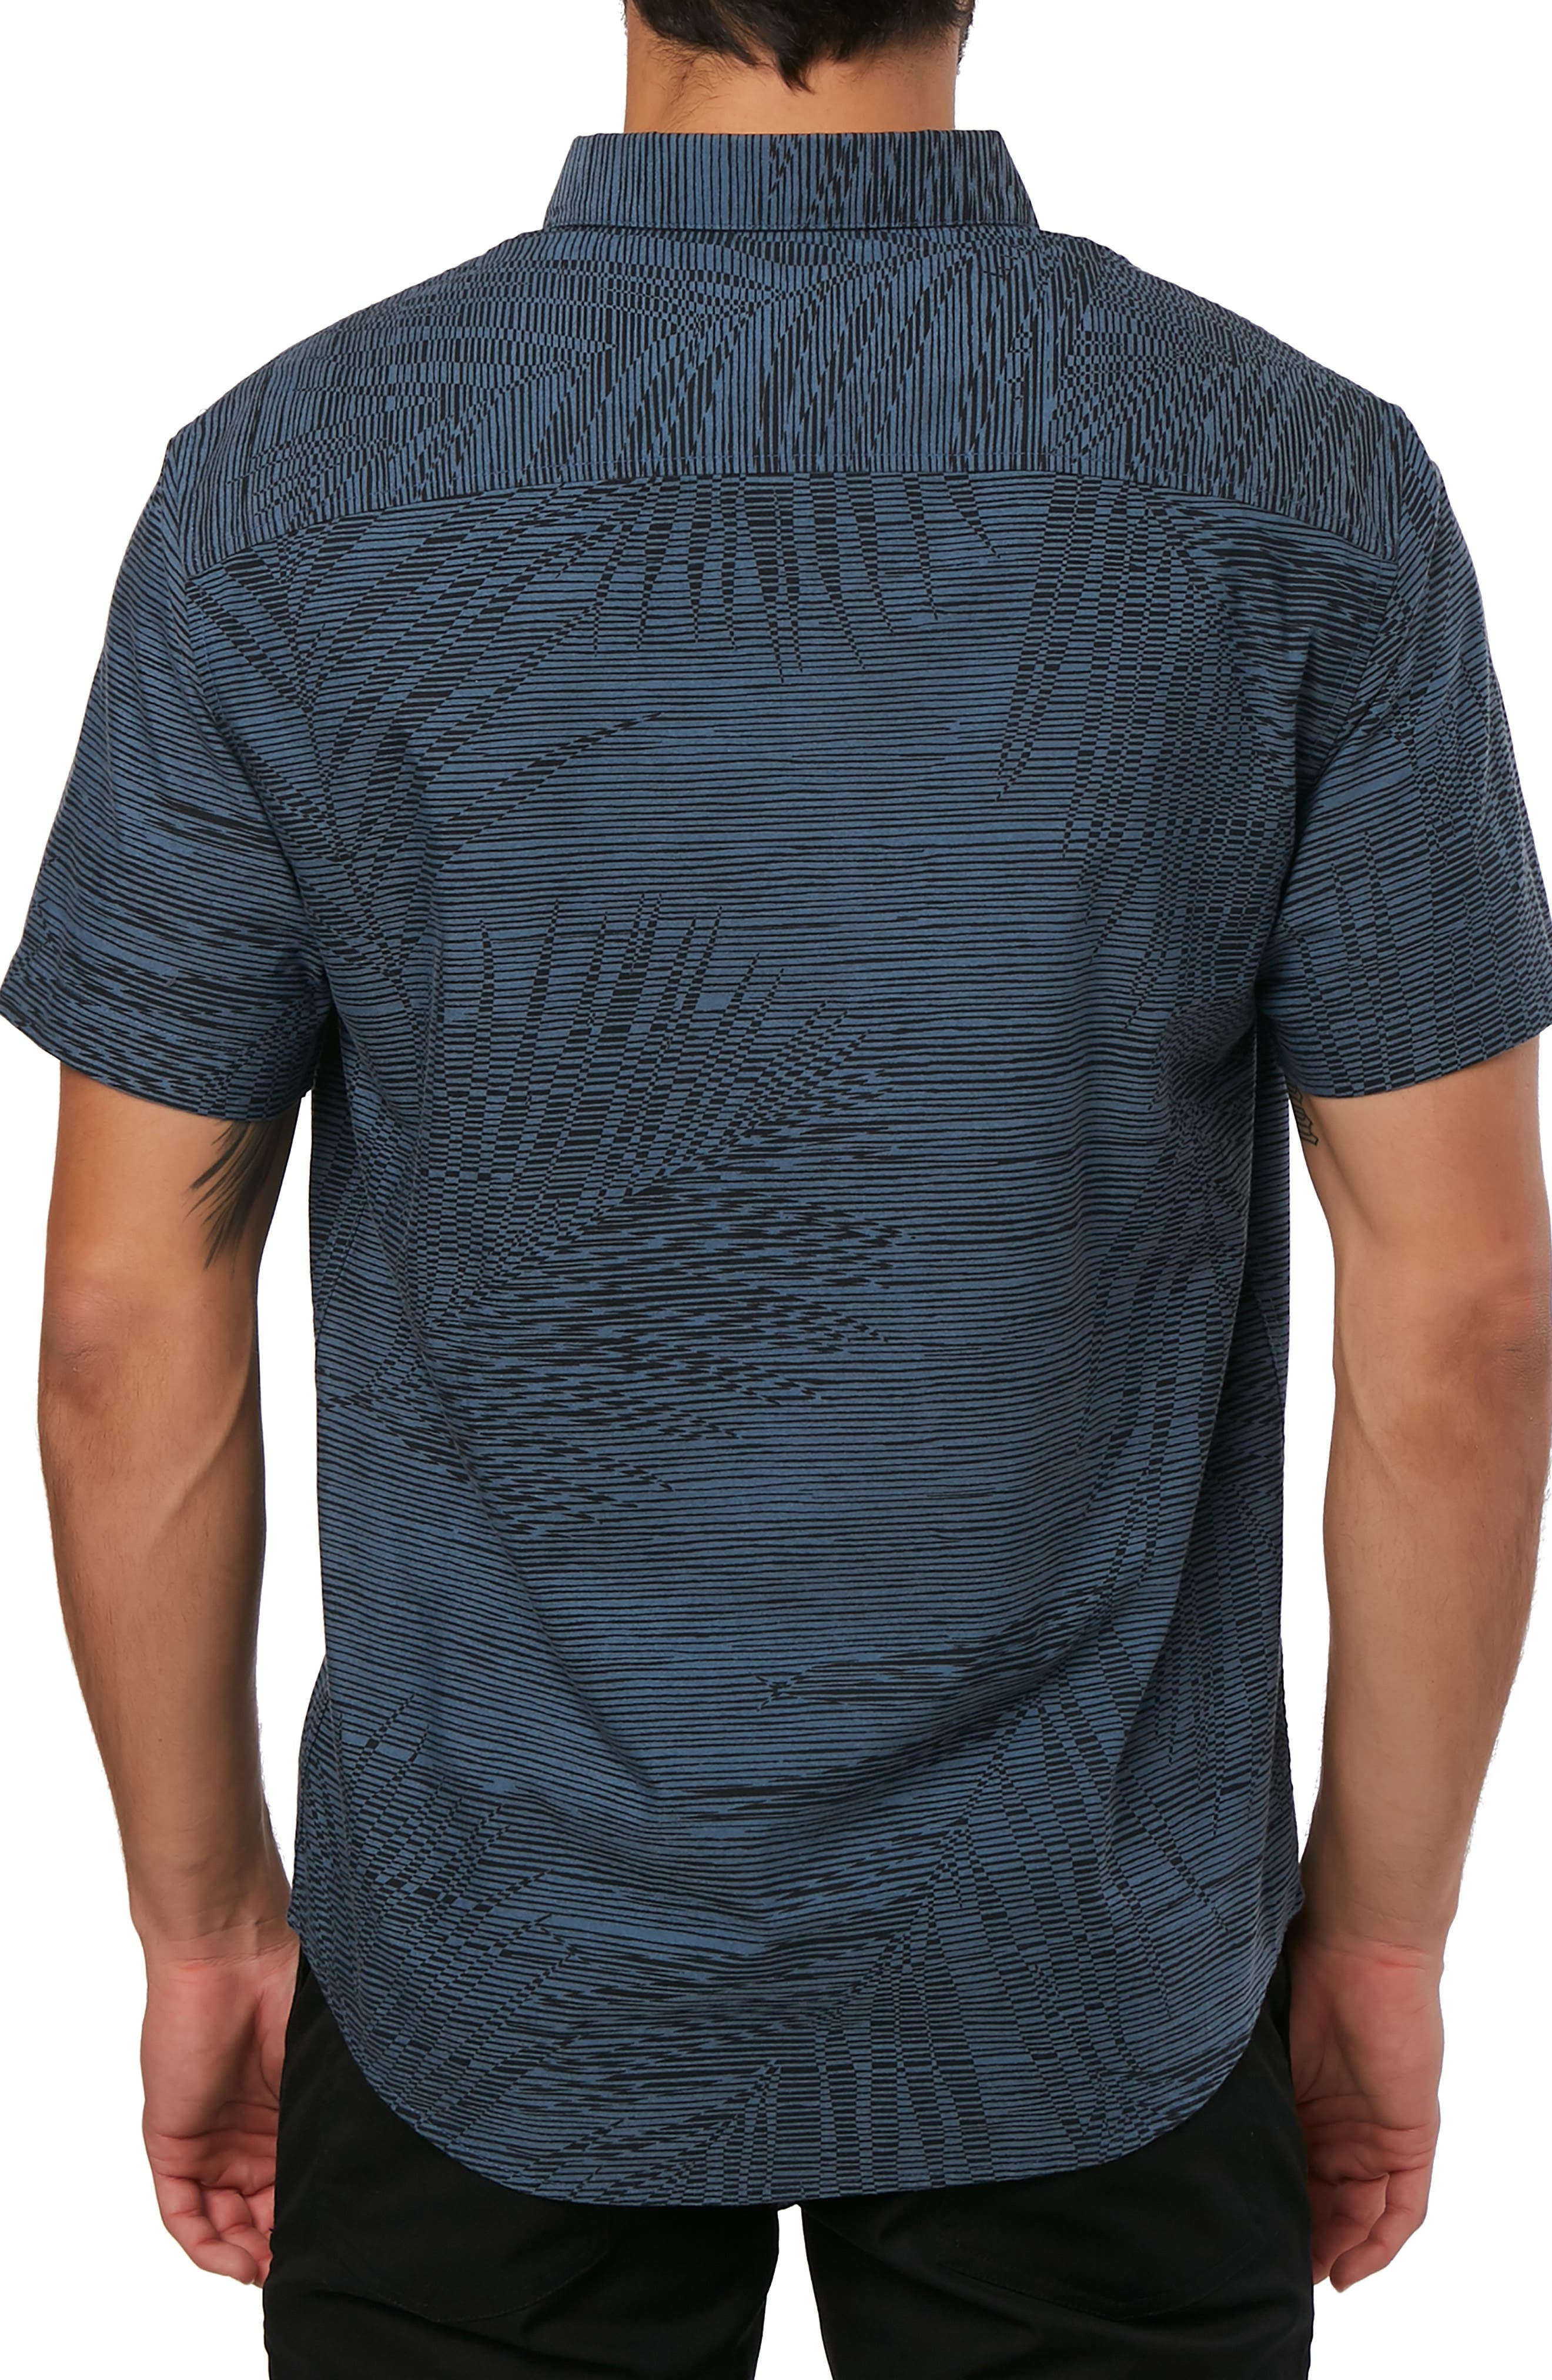 Fronzarelli Woven Shirt,                             Alternate thumbnail 2, color,                             DARK BLUE